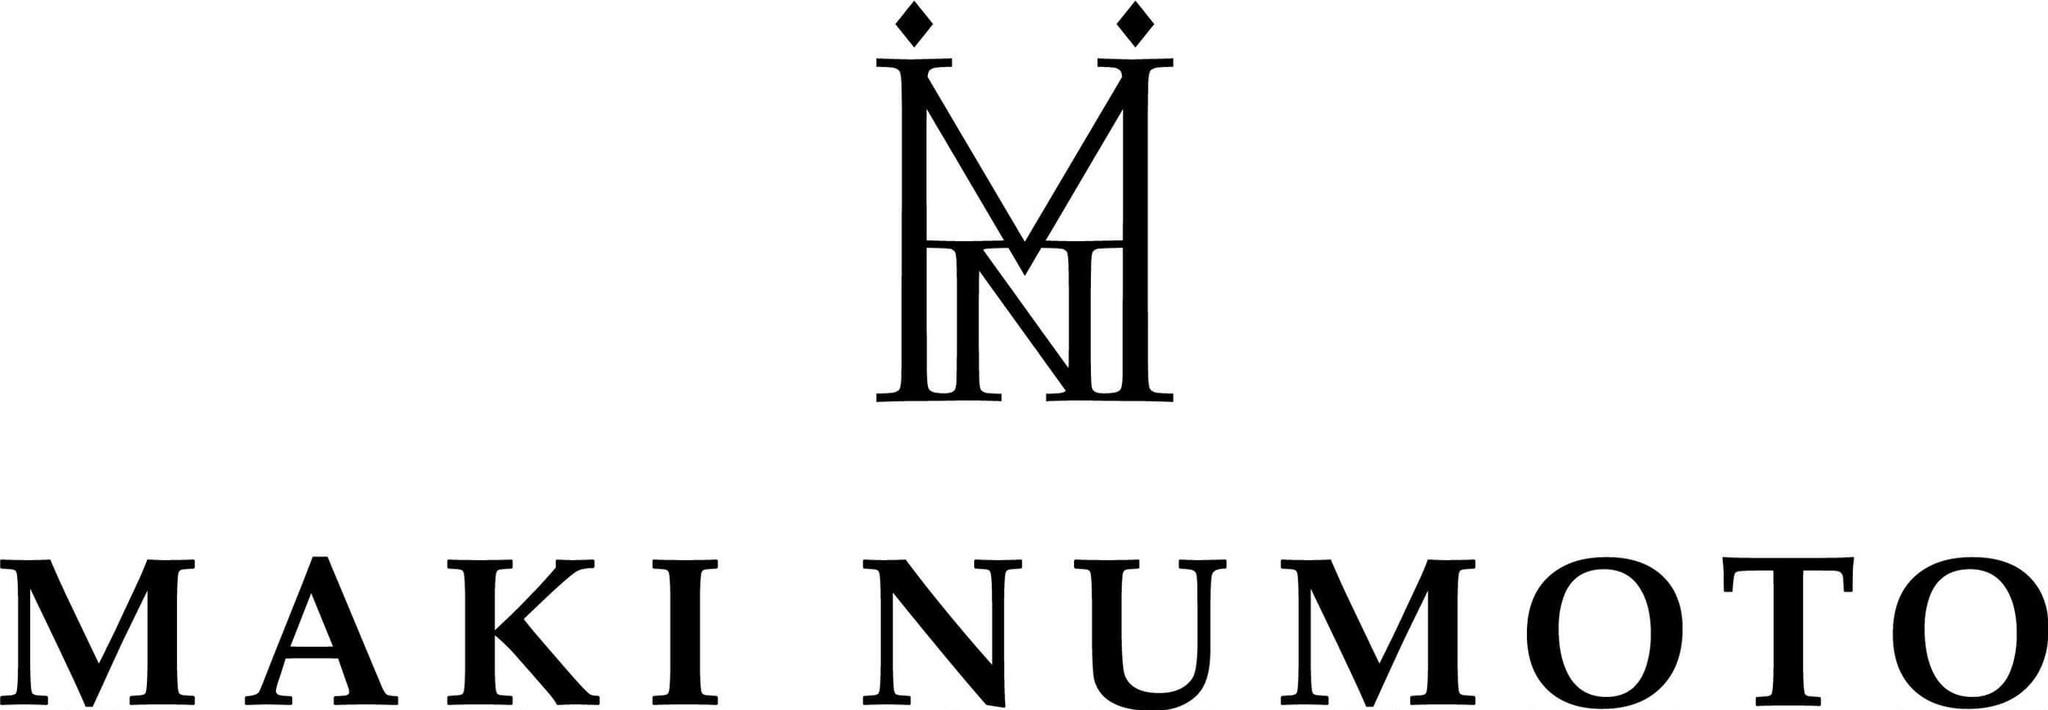 MAKI NUMOTO (マキ ヌモト) |コスチュームジュエリー 公式オンラインショップ